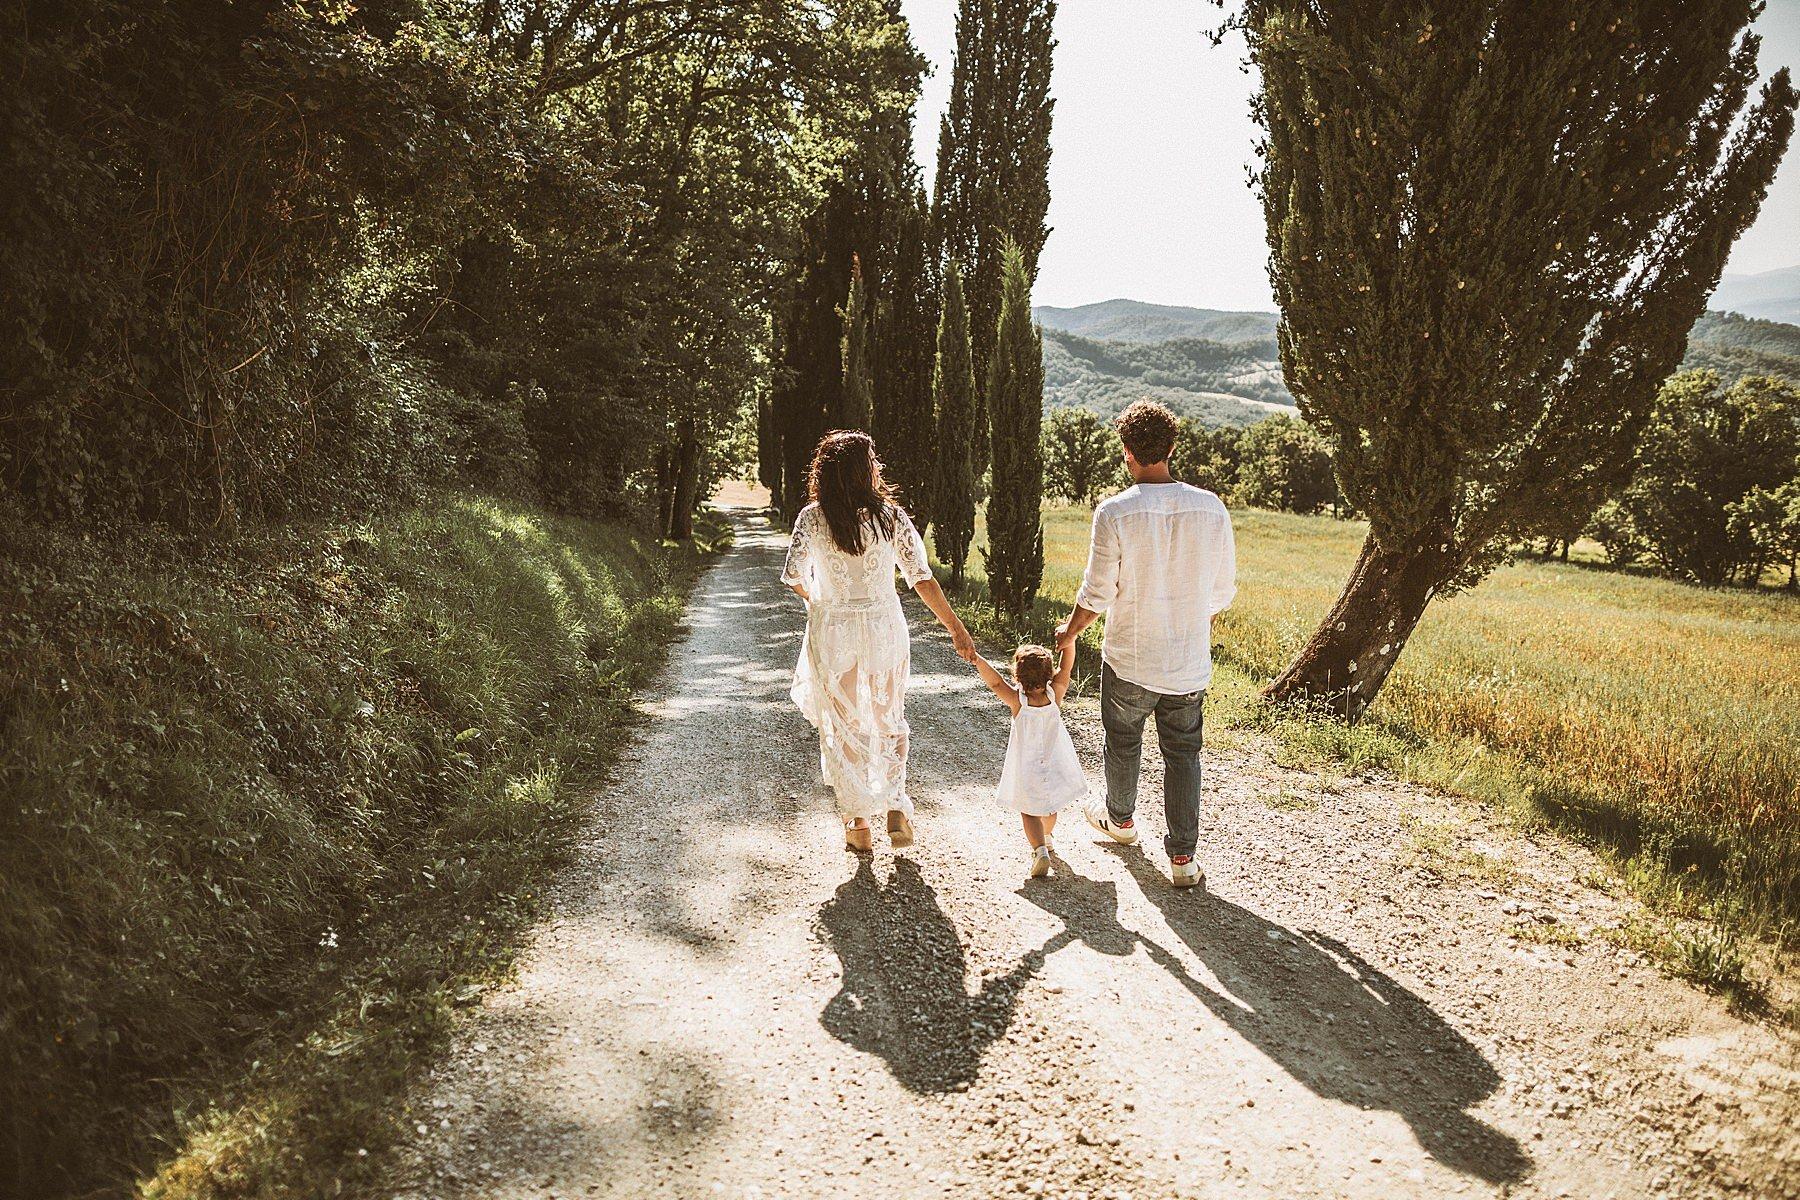 foto di famiglia nelle campagne di firenze